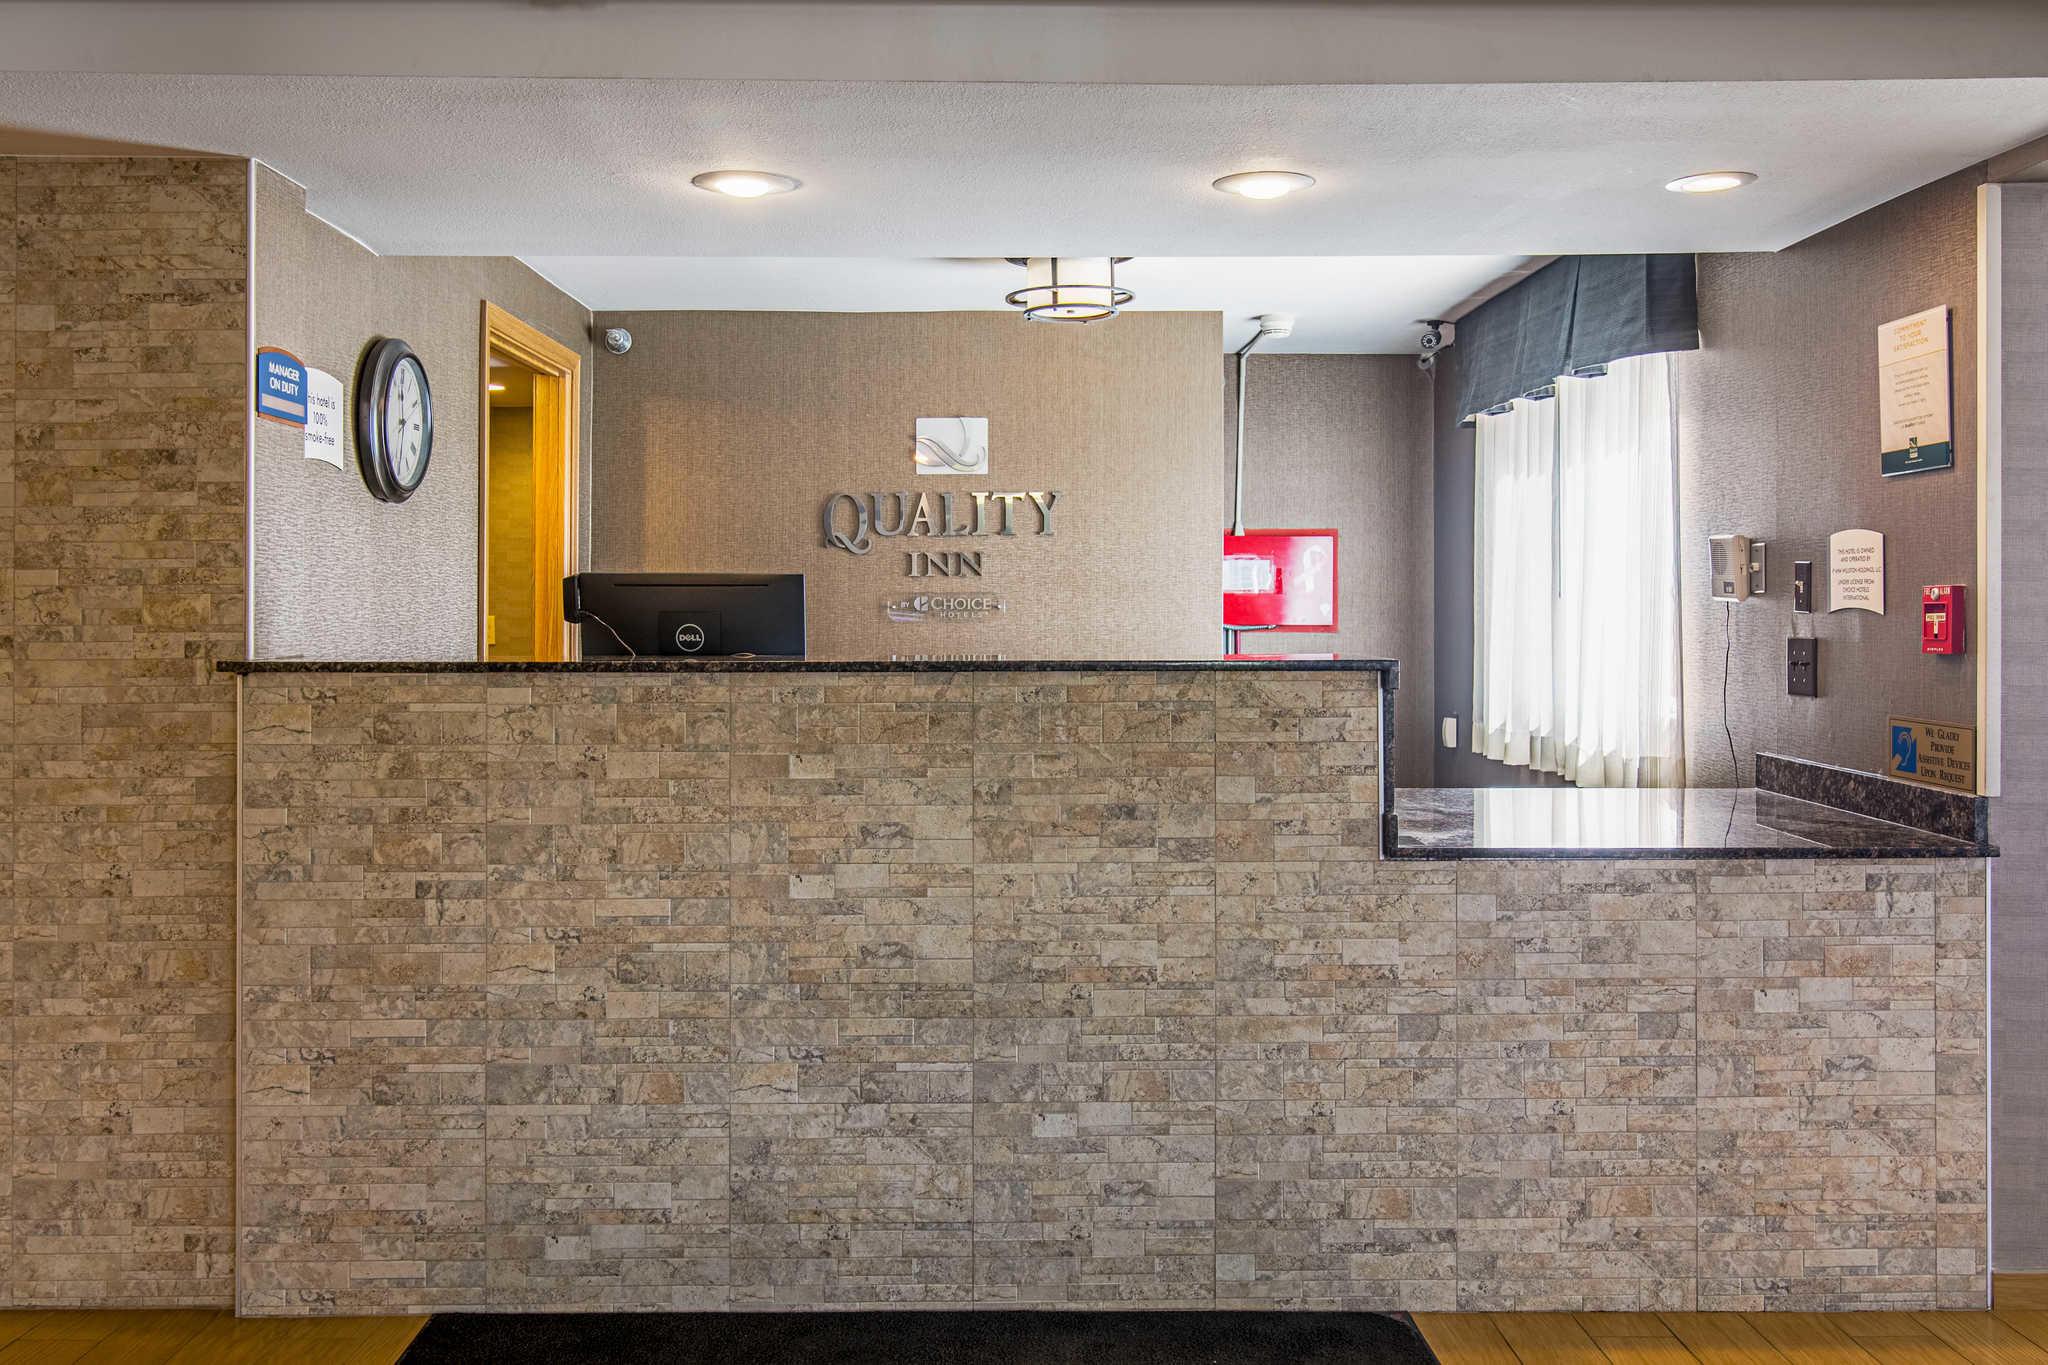 Quality Inn image 2